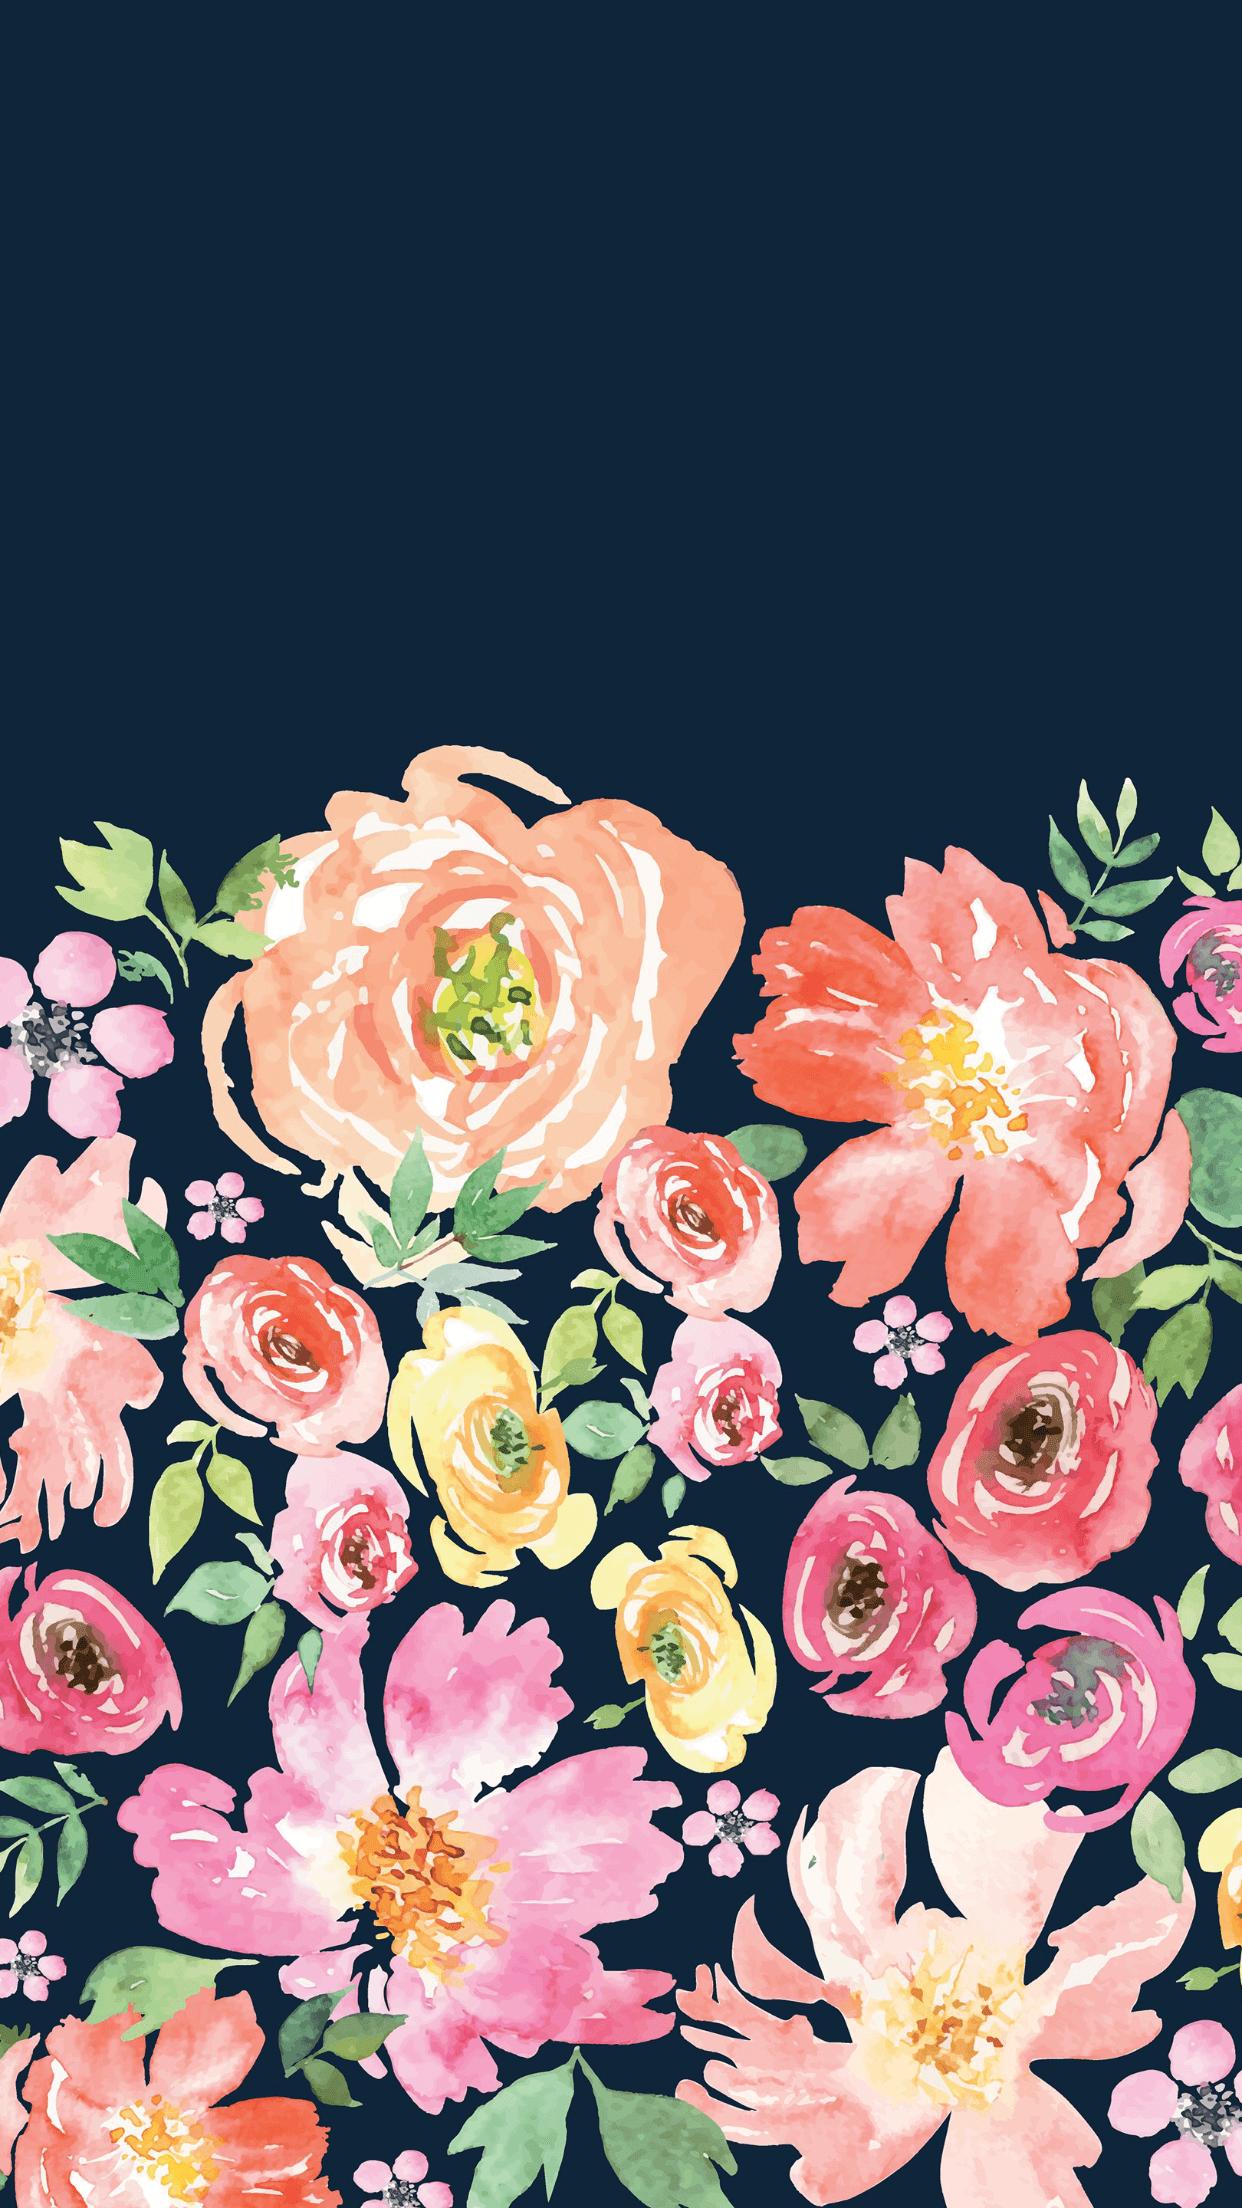 Dark Floral iPhone Wallpapers , Top Free Dark Floral iPhone